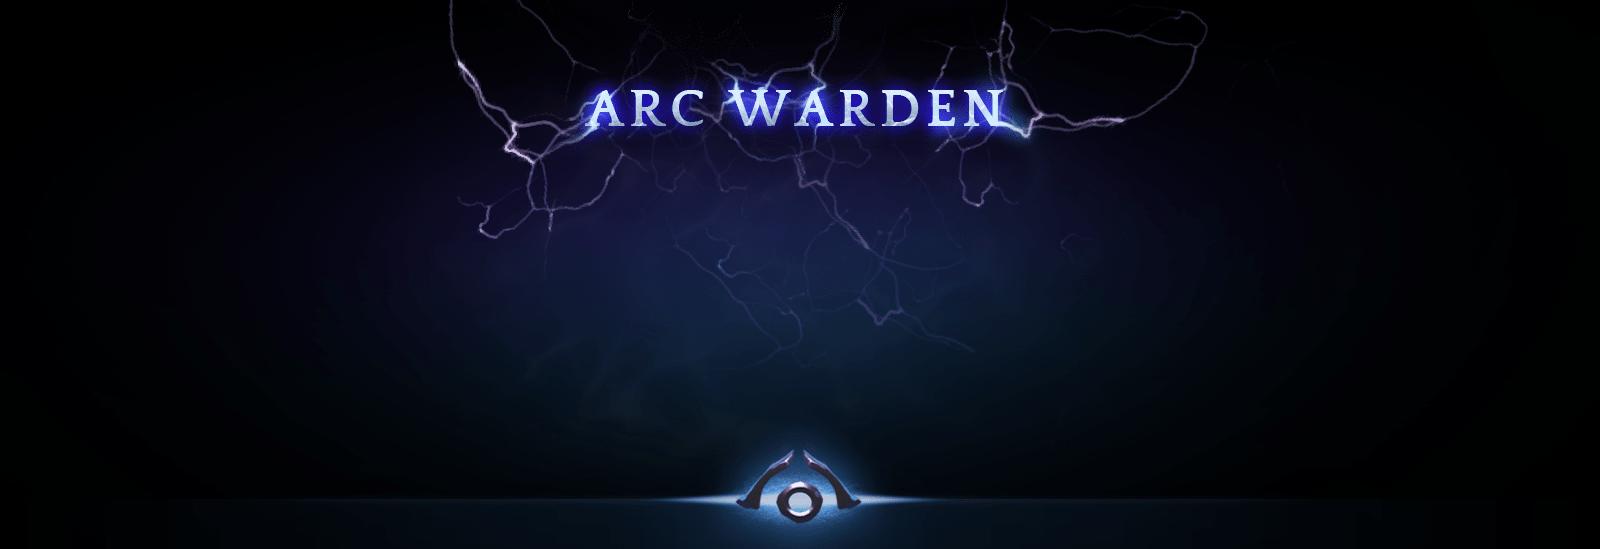 Dota2 : Arc Warden Wallpapers